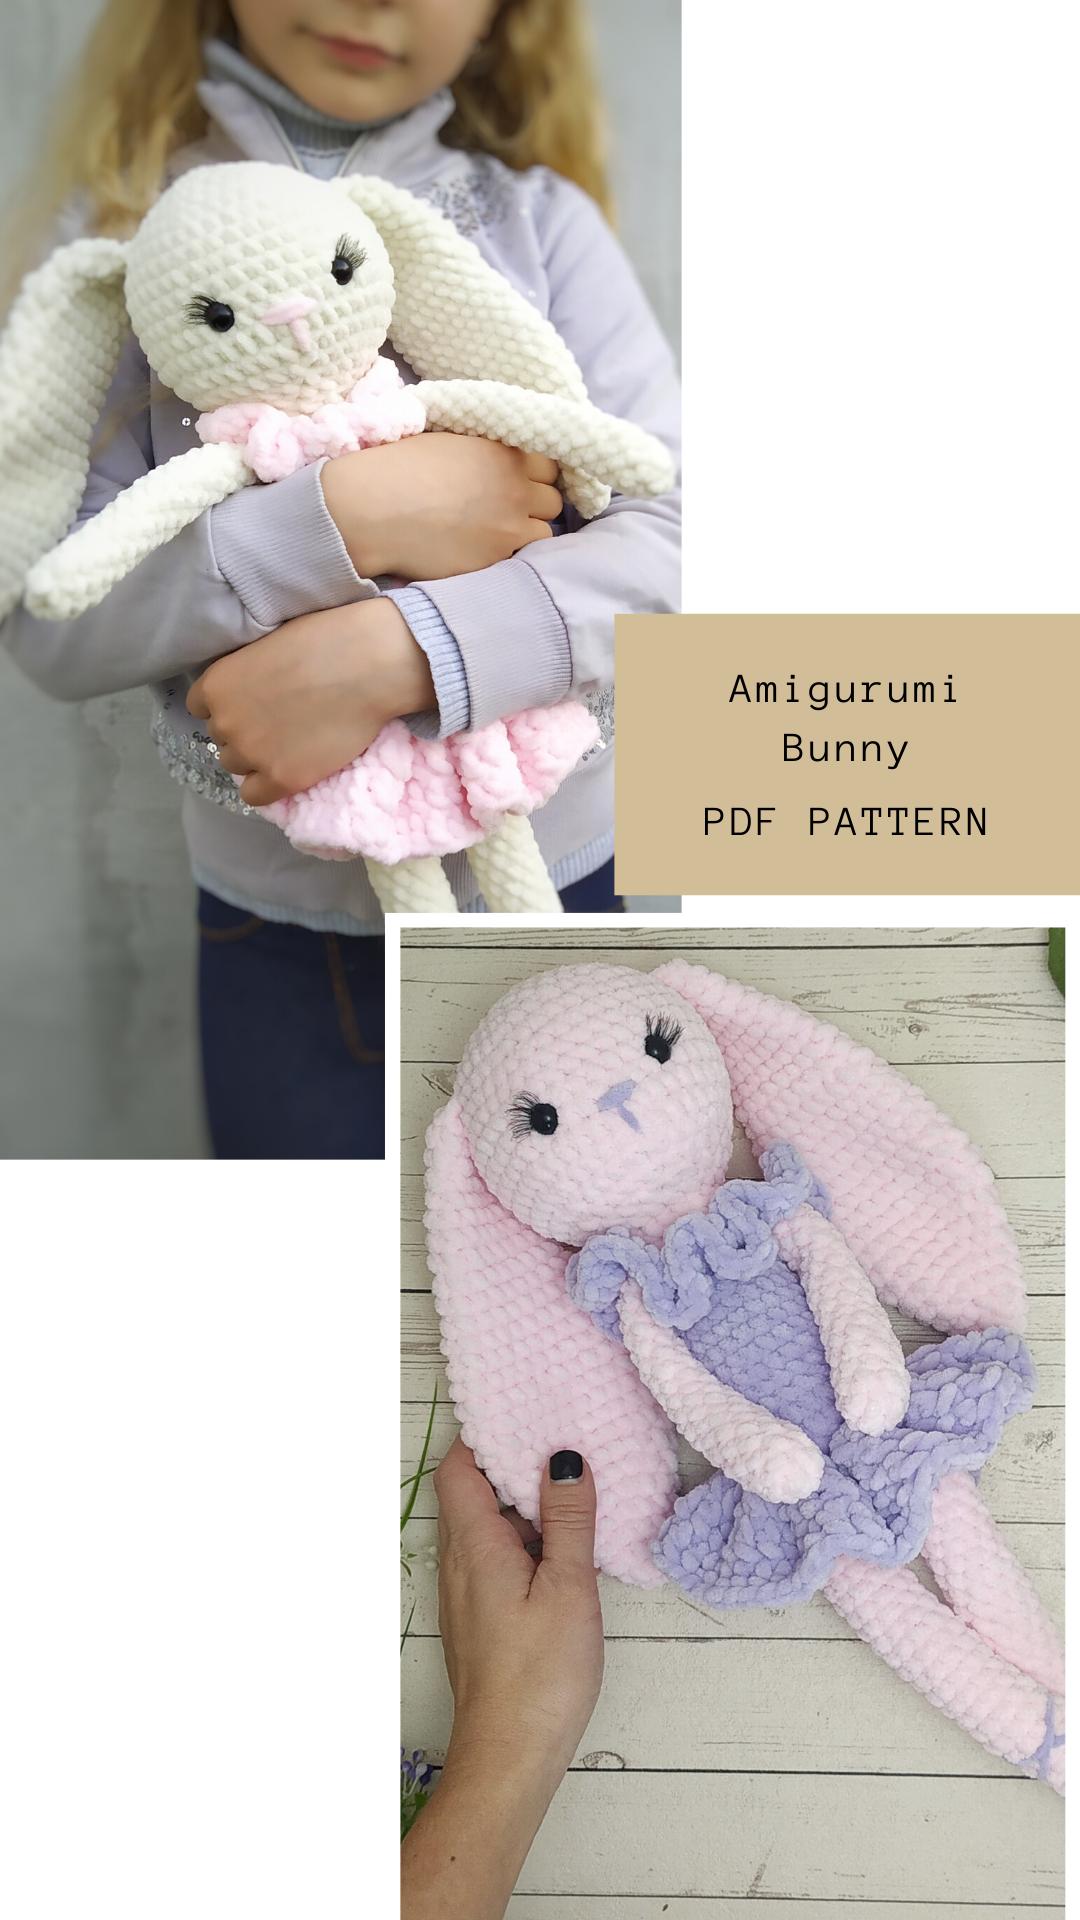 Stuffed Bunny PATTERN amigurumi crochet - amigurumi toy - crochet animal pattern - Plush toy pattern